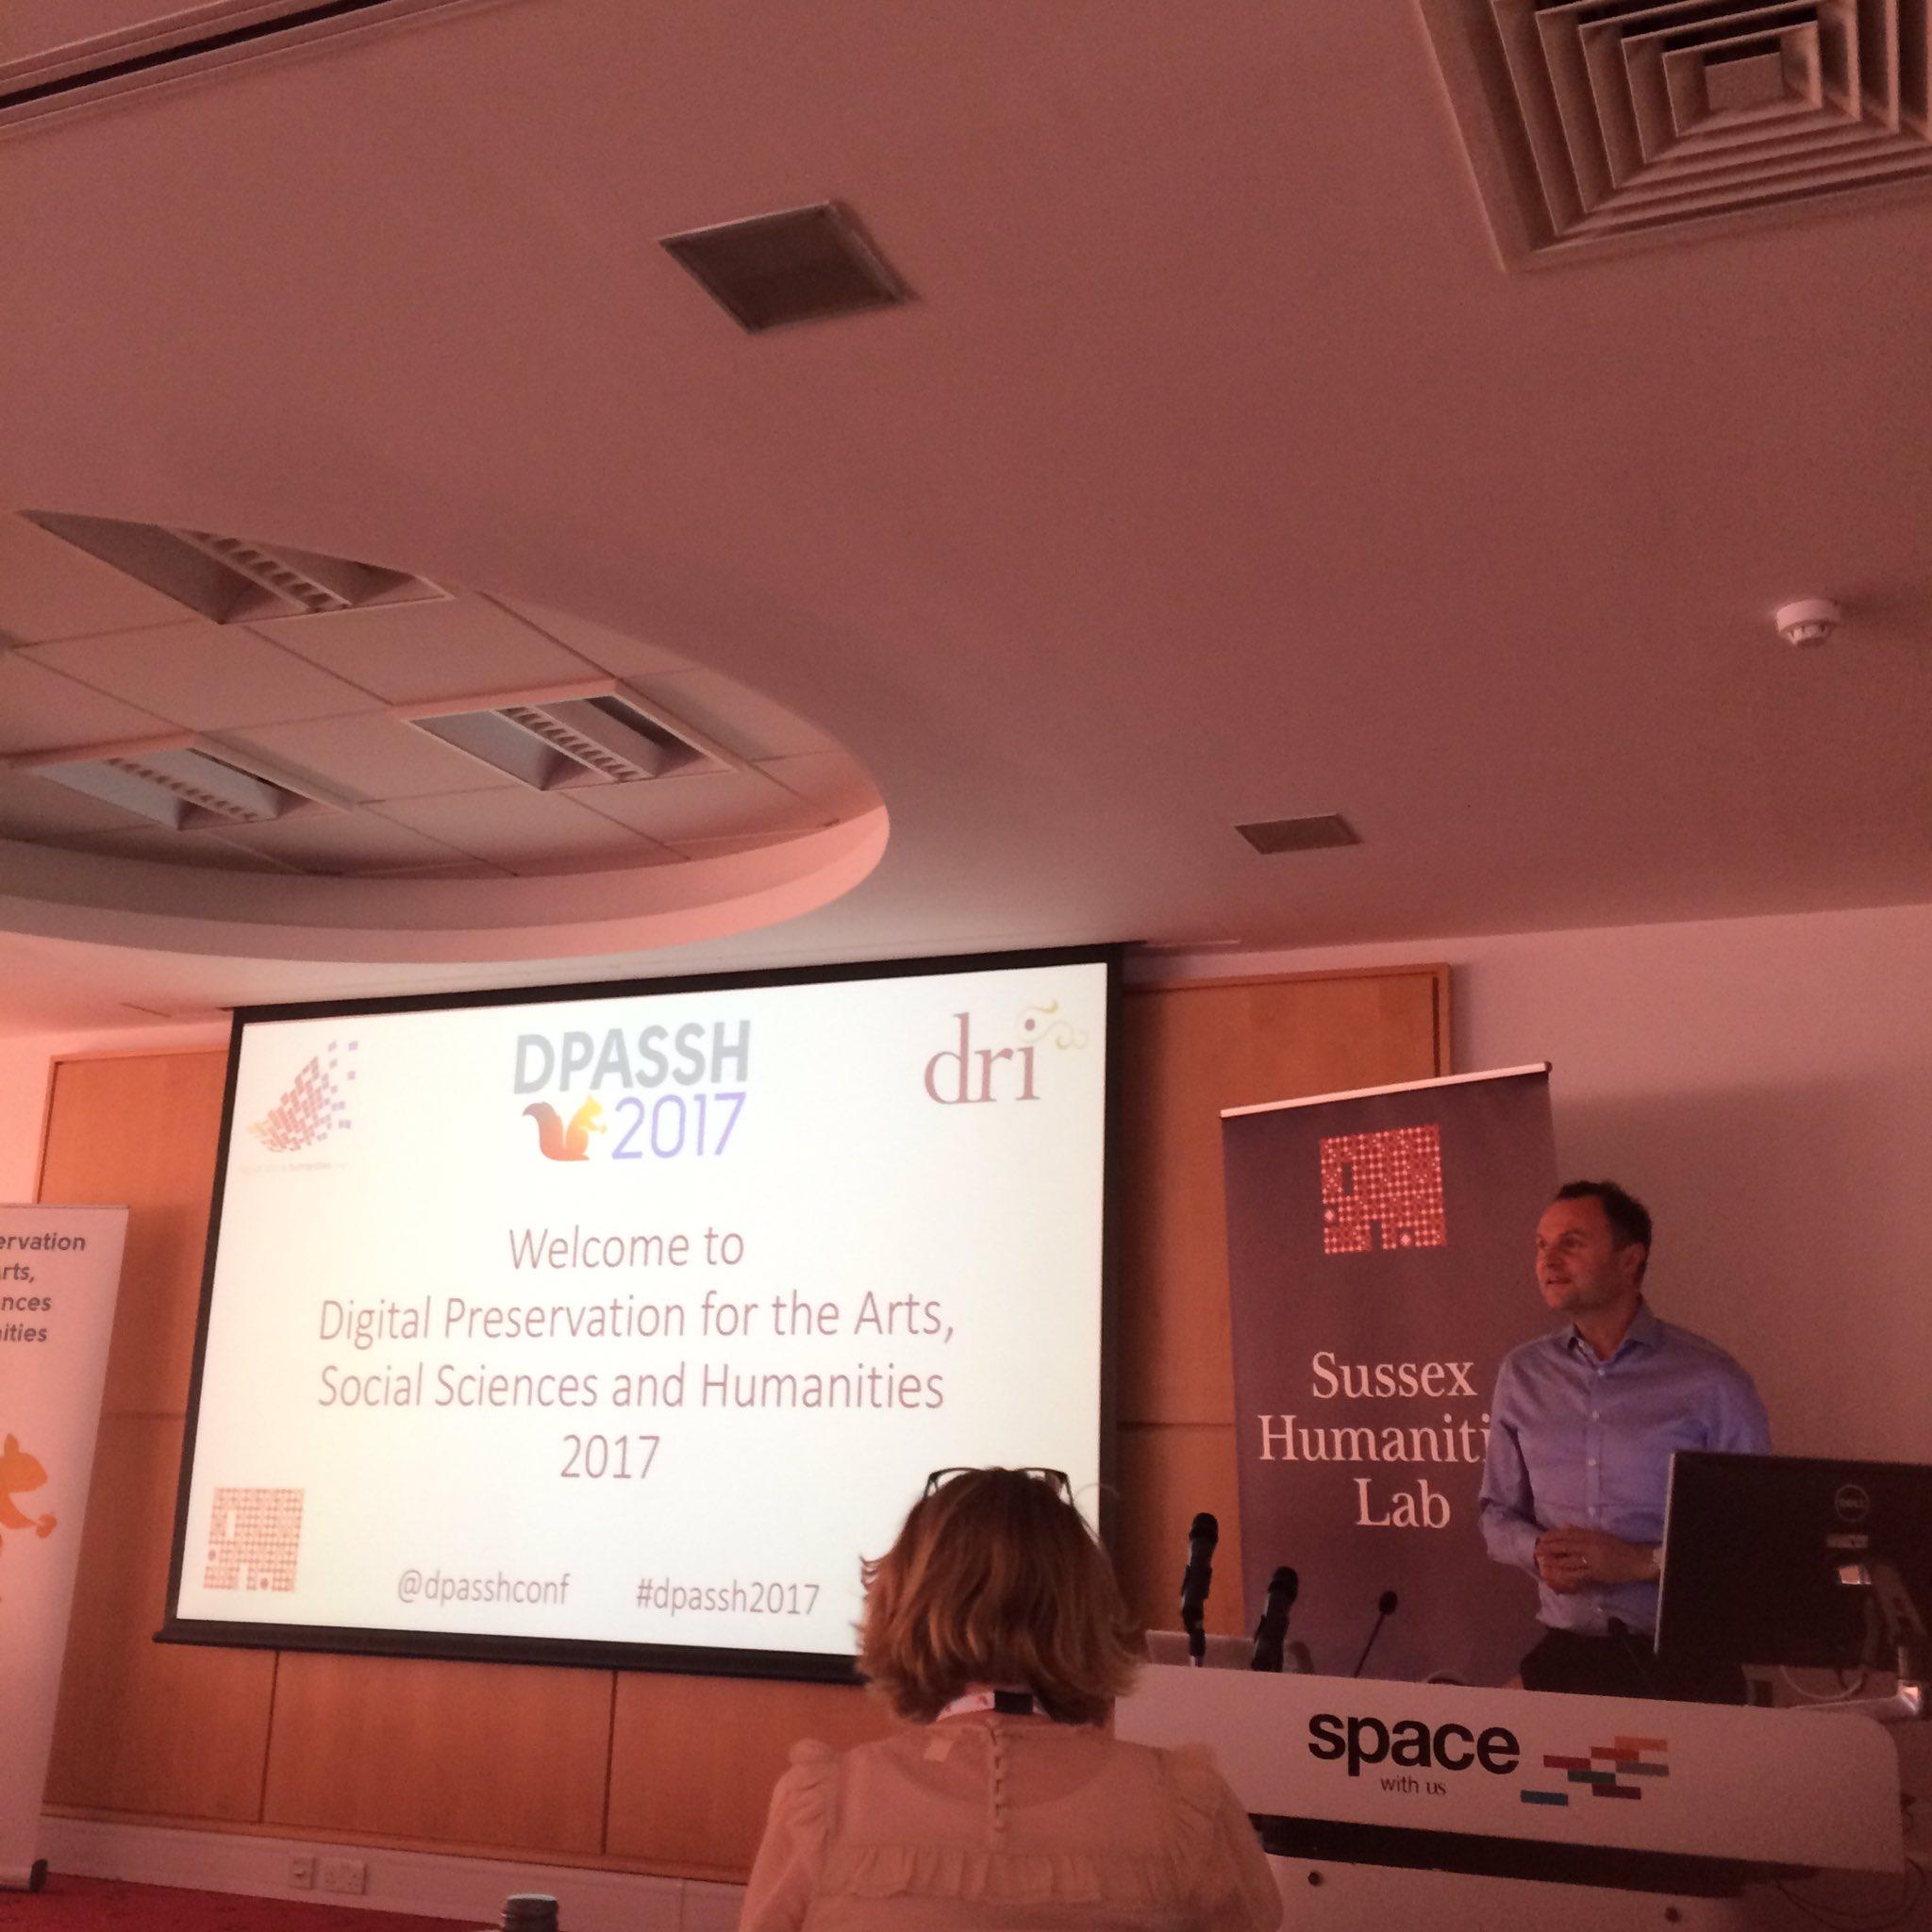 Professor Adam Tickell, Vice Chancellor of @SussexUni, speaking at opening of #DPASSH2017 https://t.co/T8CdRGqdEc